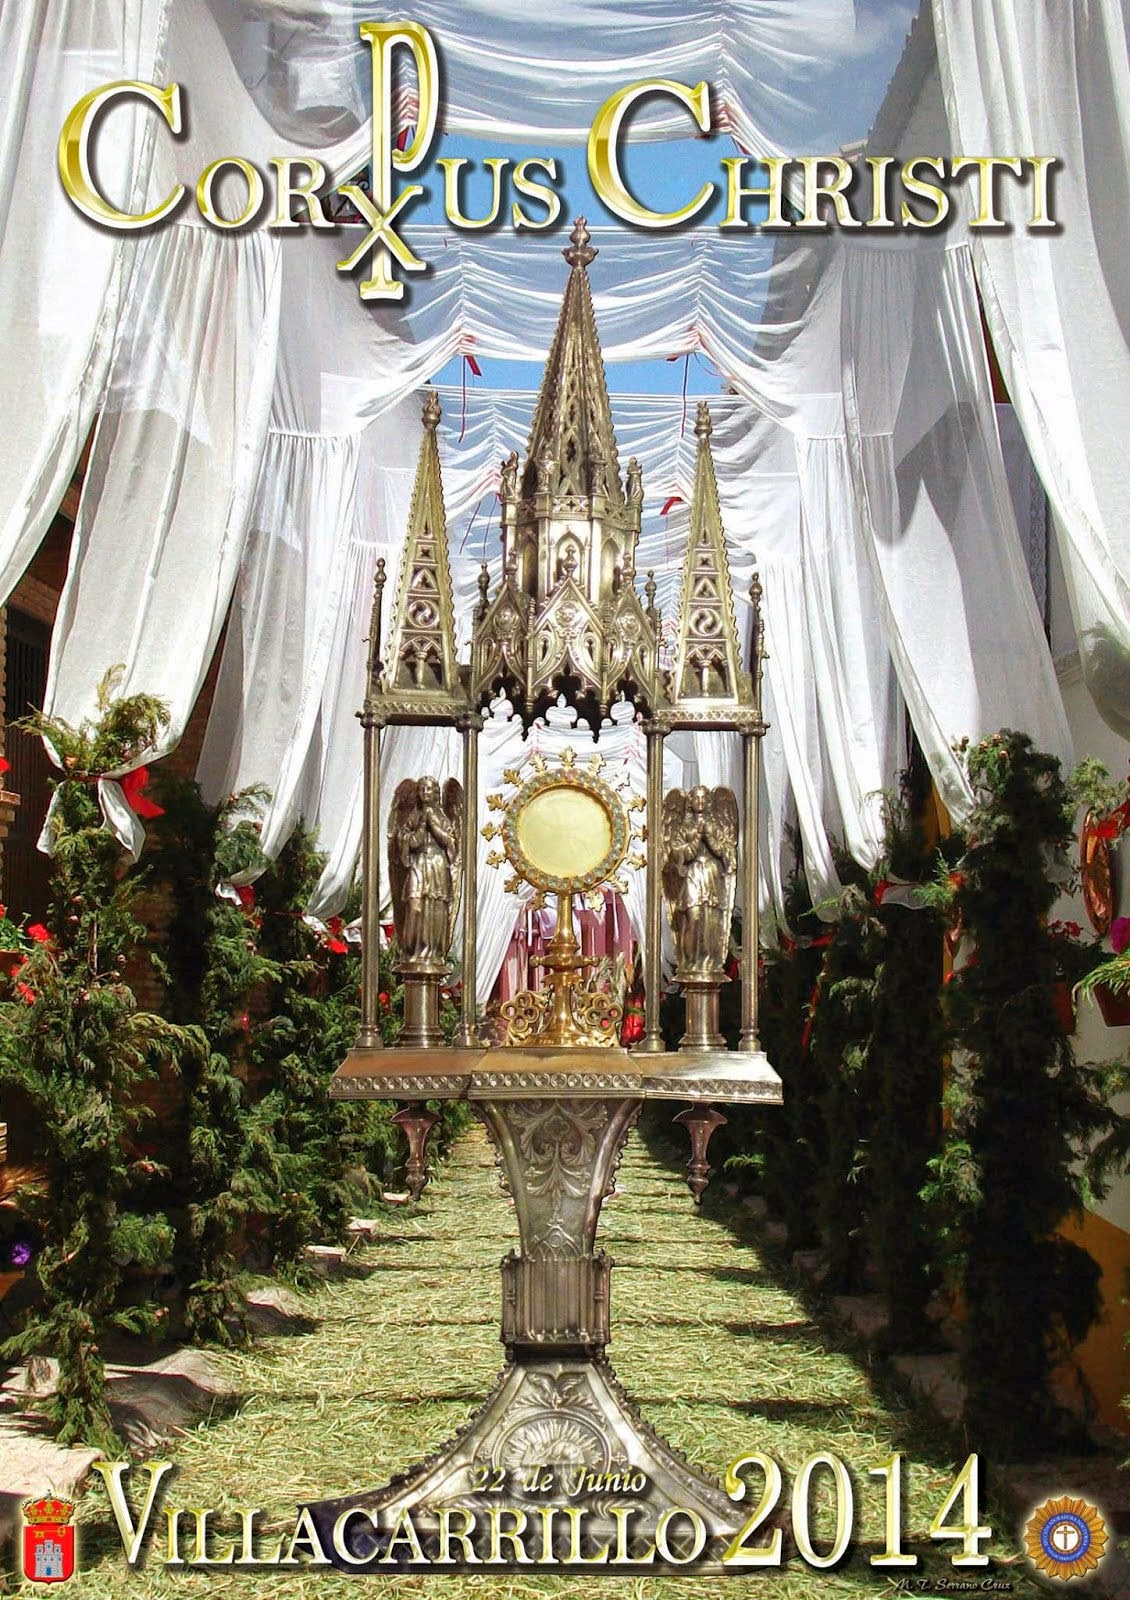 Fiesta del corpus christi 2014 aznalfarache for Azulejeria antigua cordoba